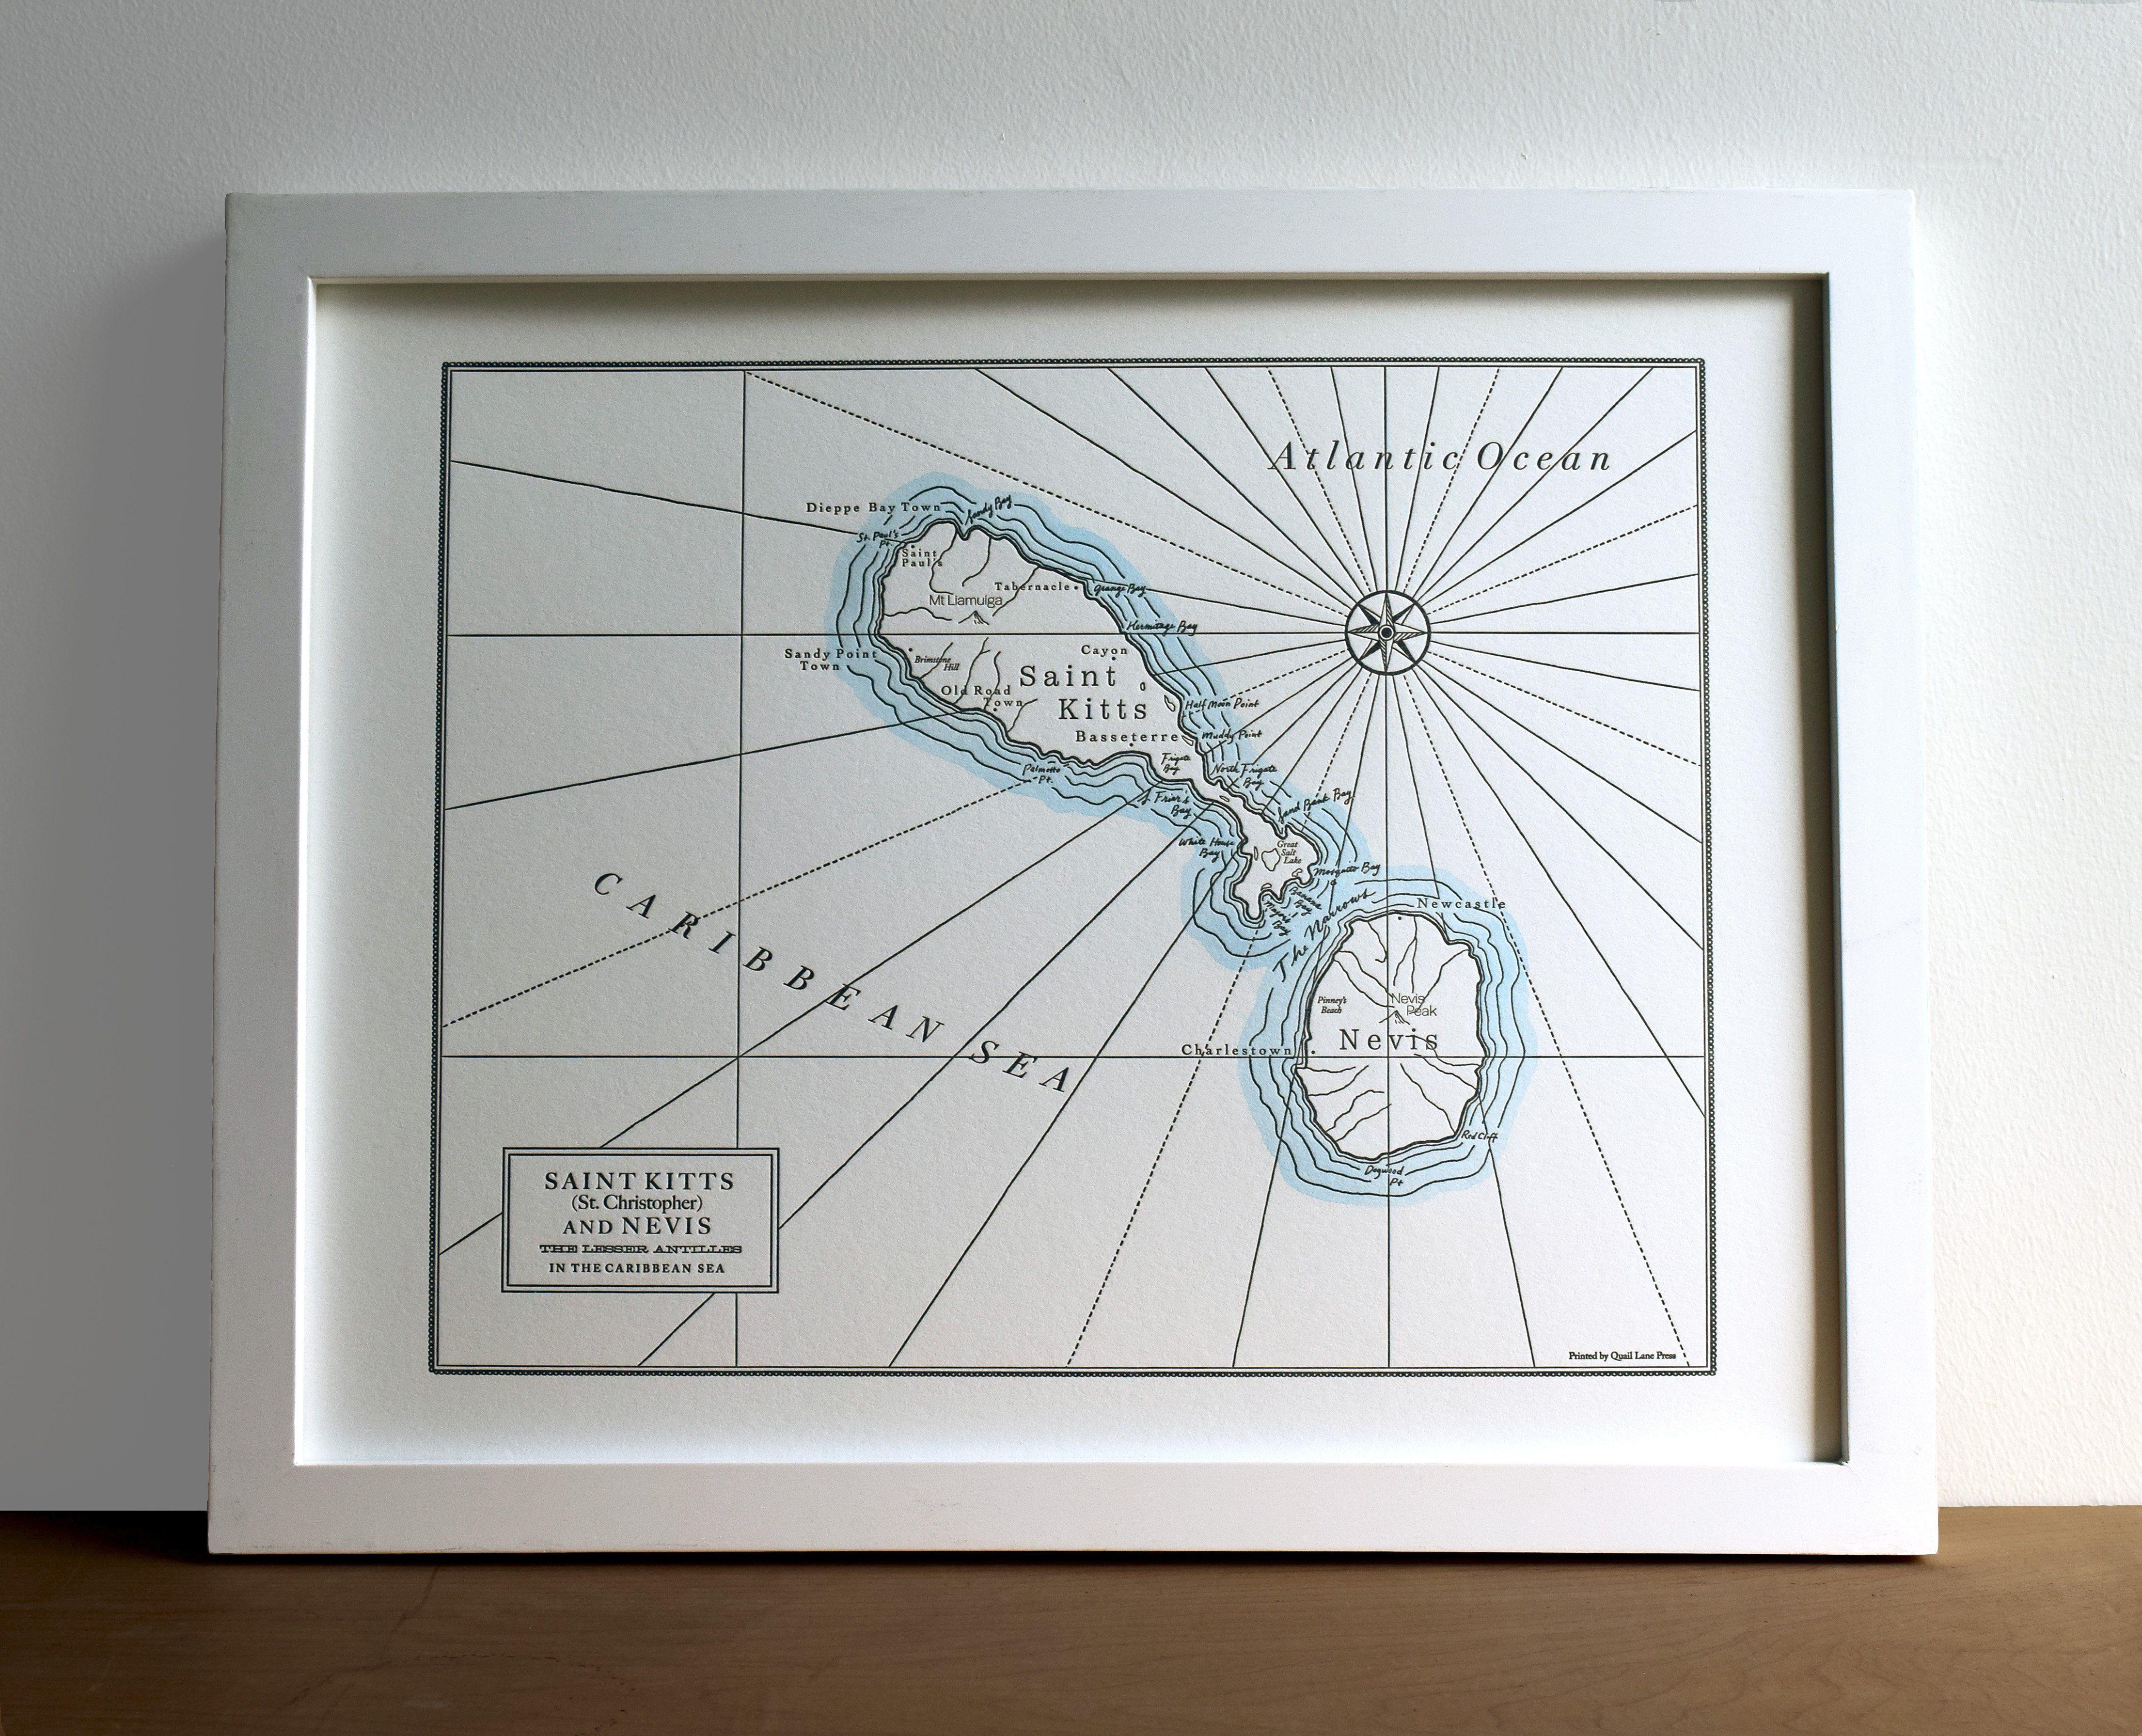 Imagini pentru saint kitts island map